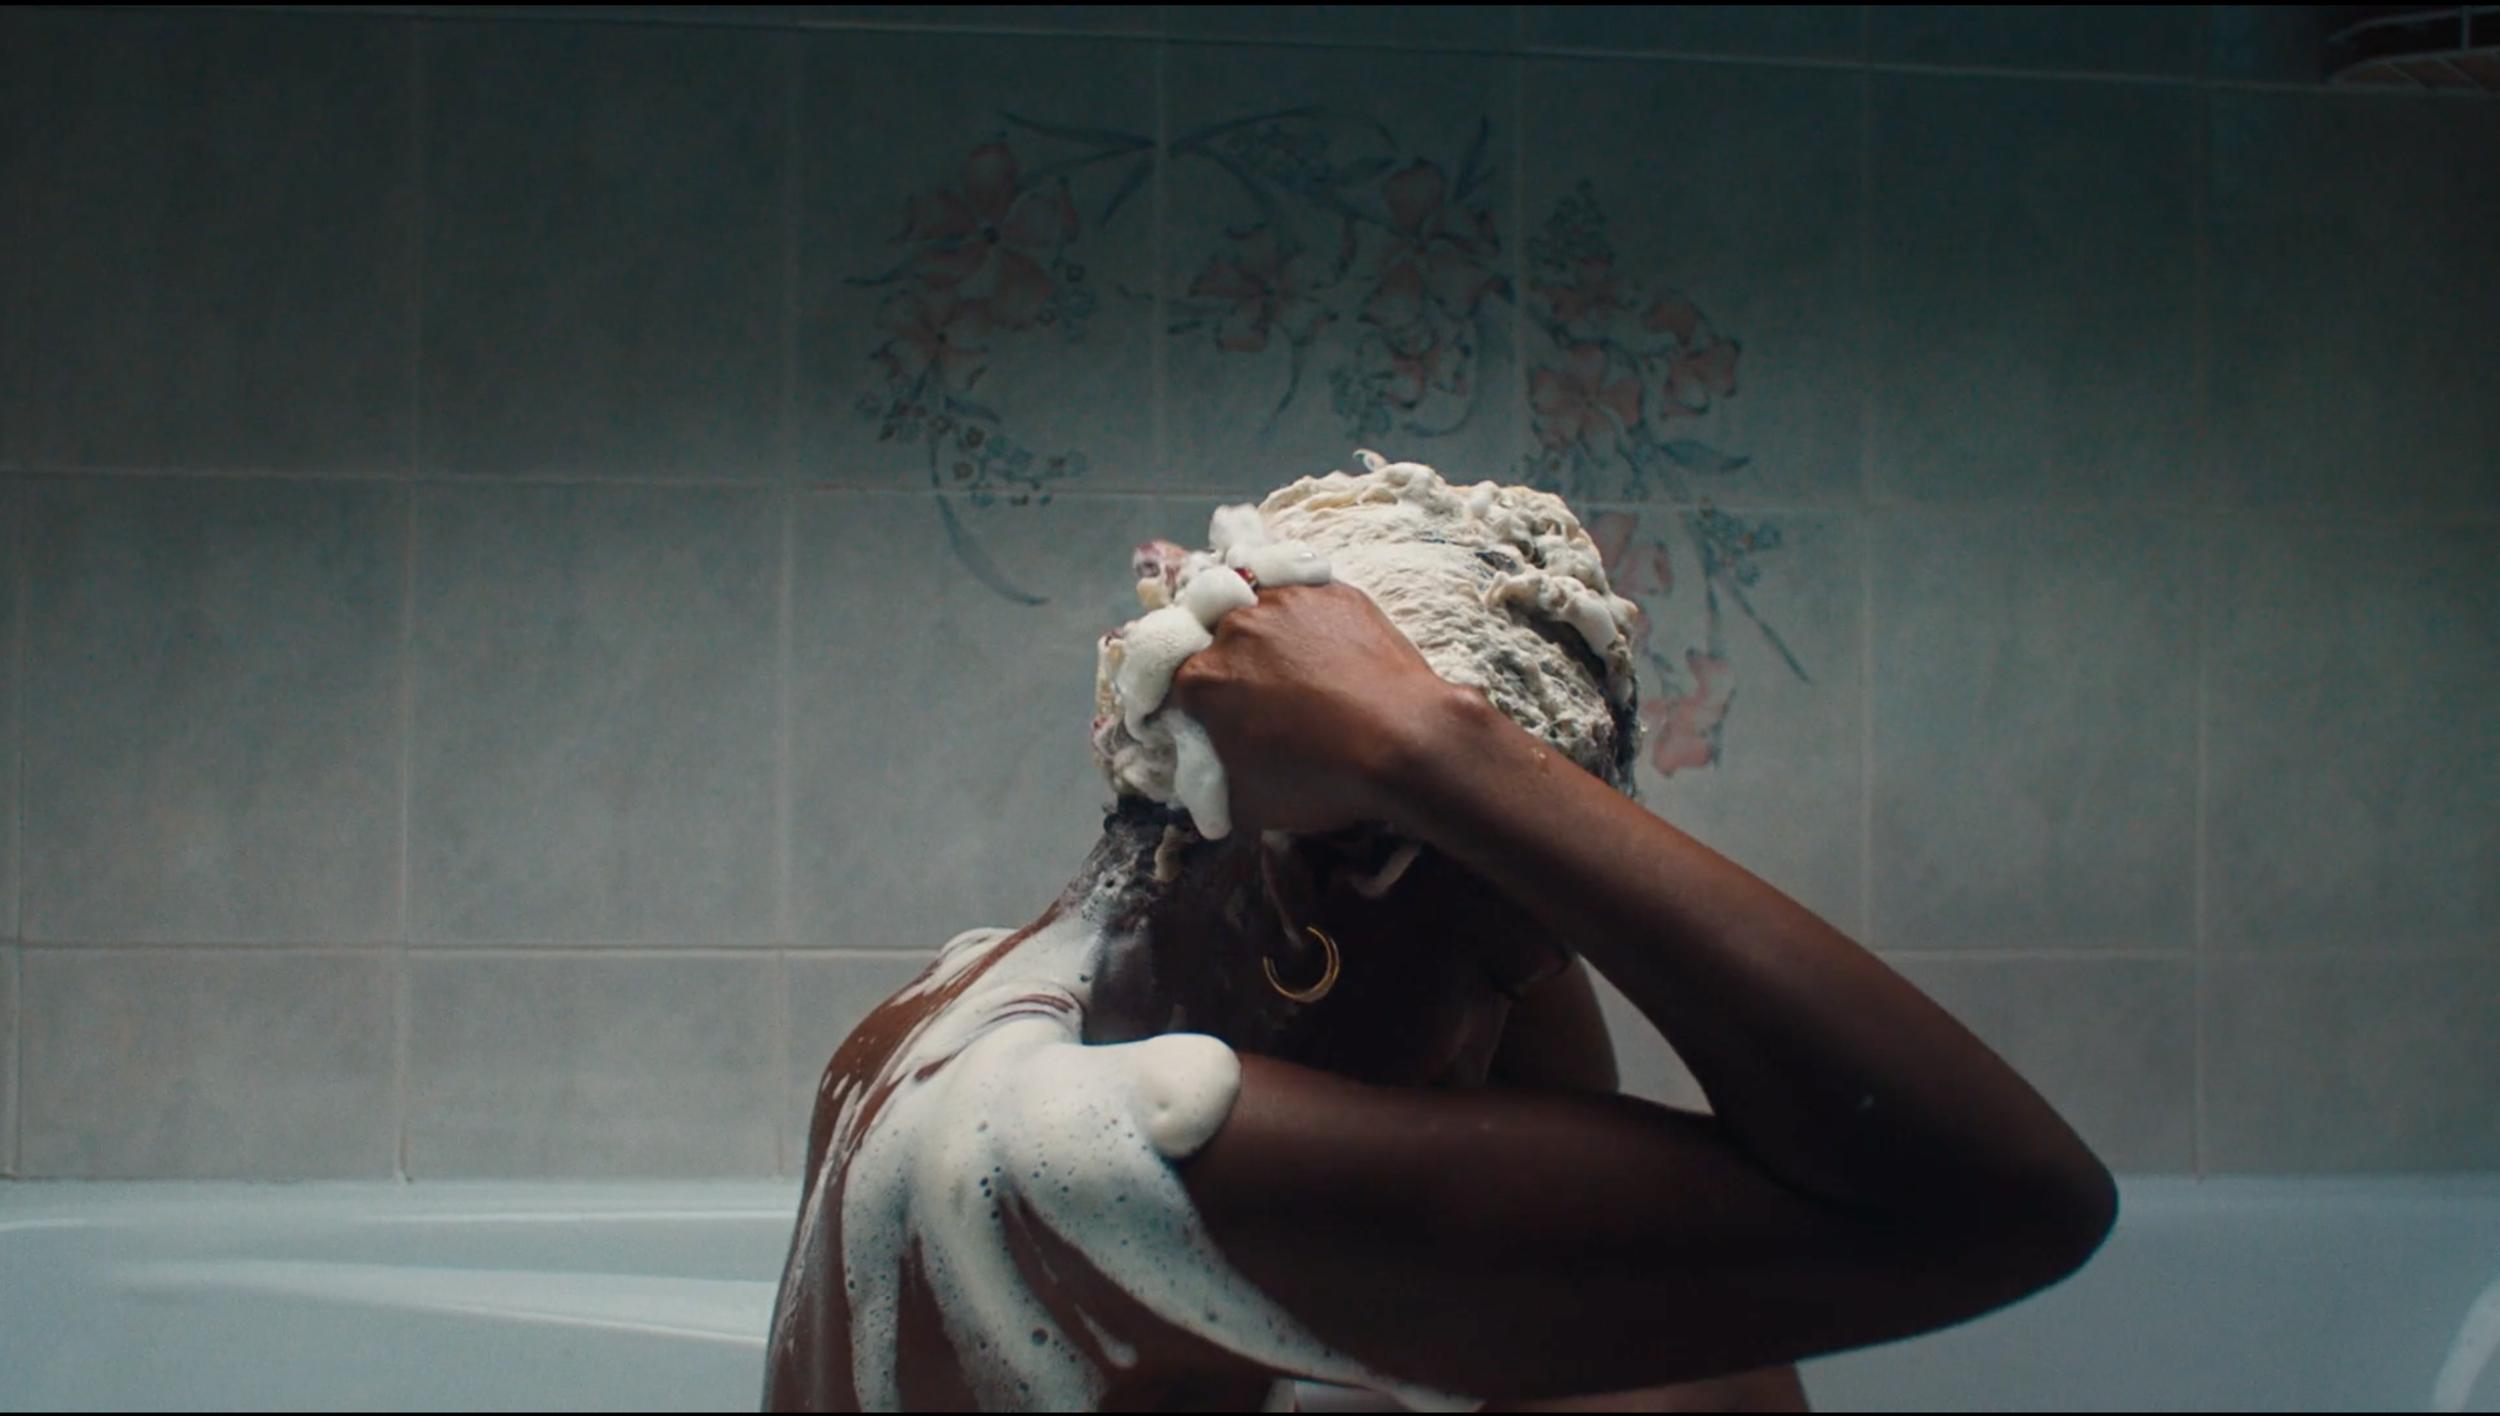 Creative Director at NOWNESS Bunny Kinney selects Filmmaker Rhea Dillon